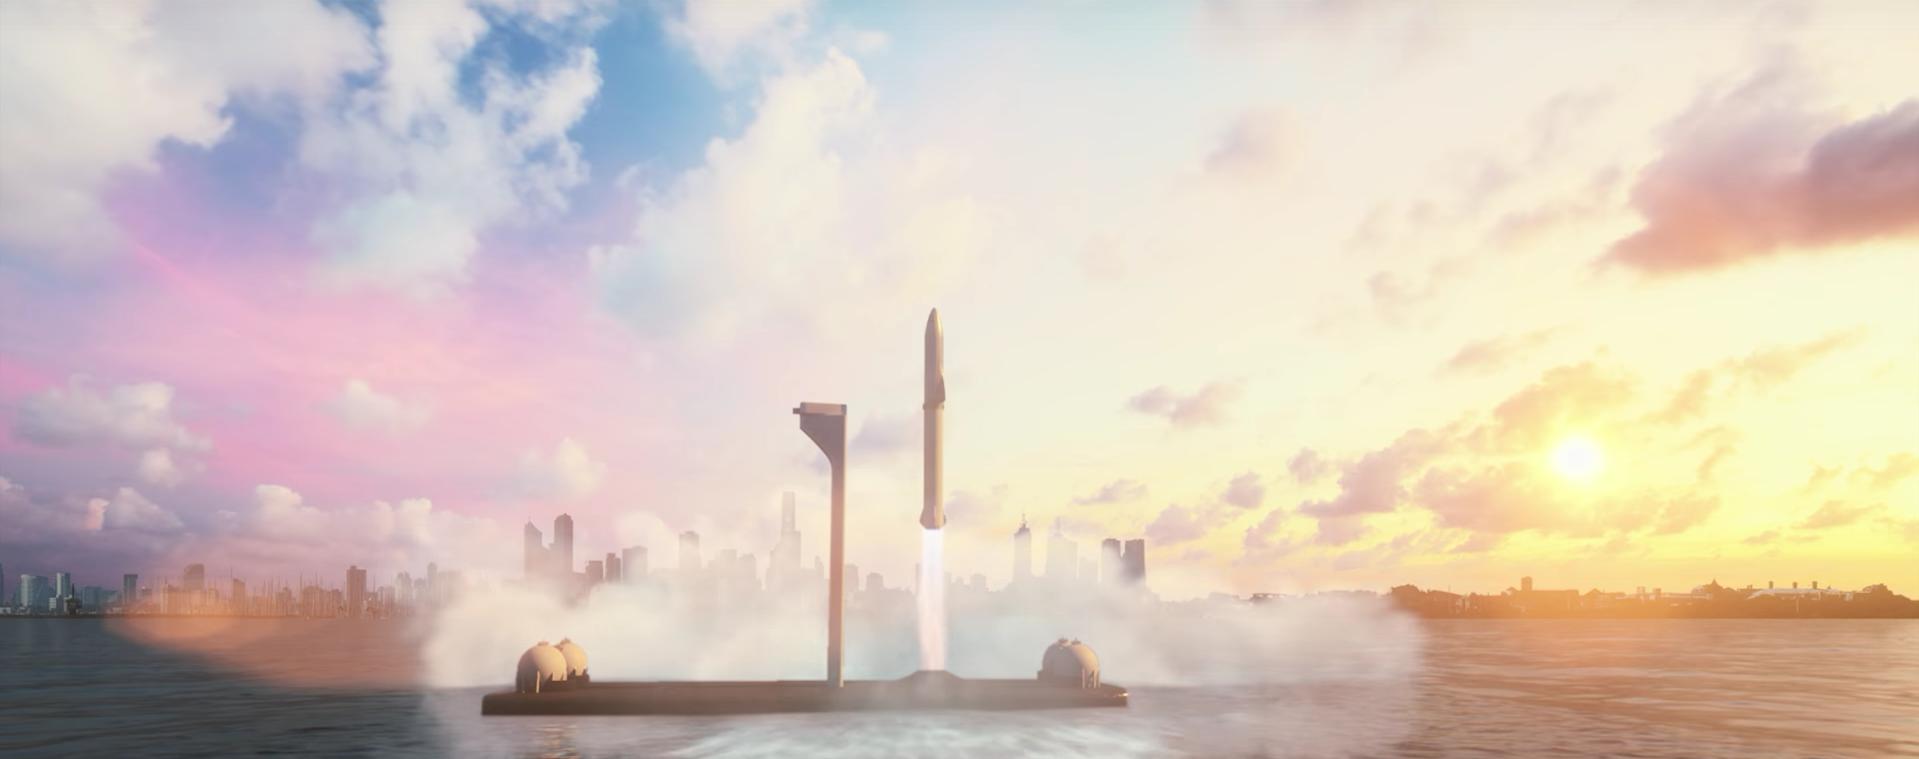 BFR, Starship, SpaceX